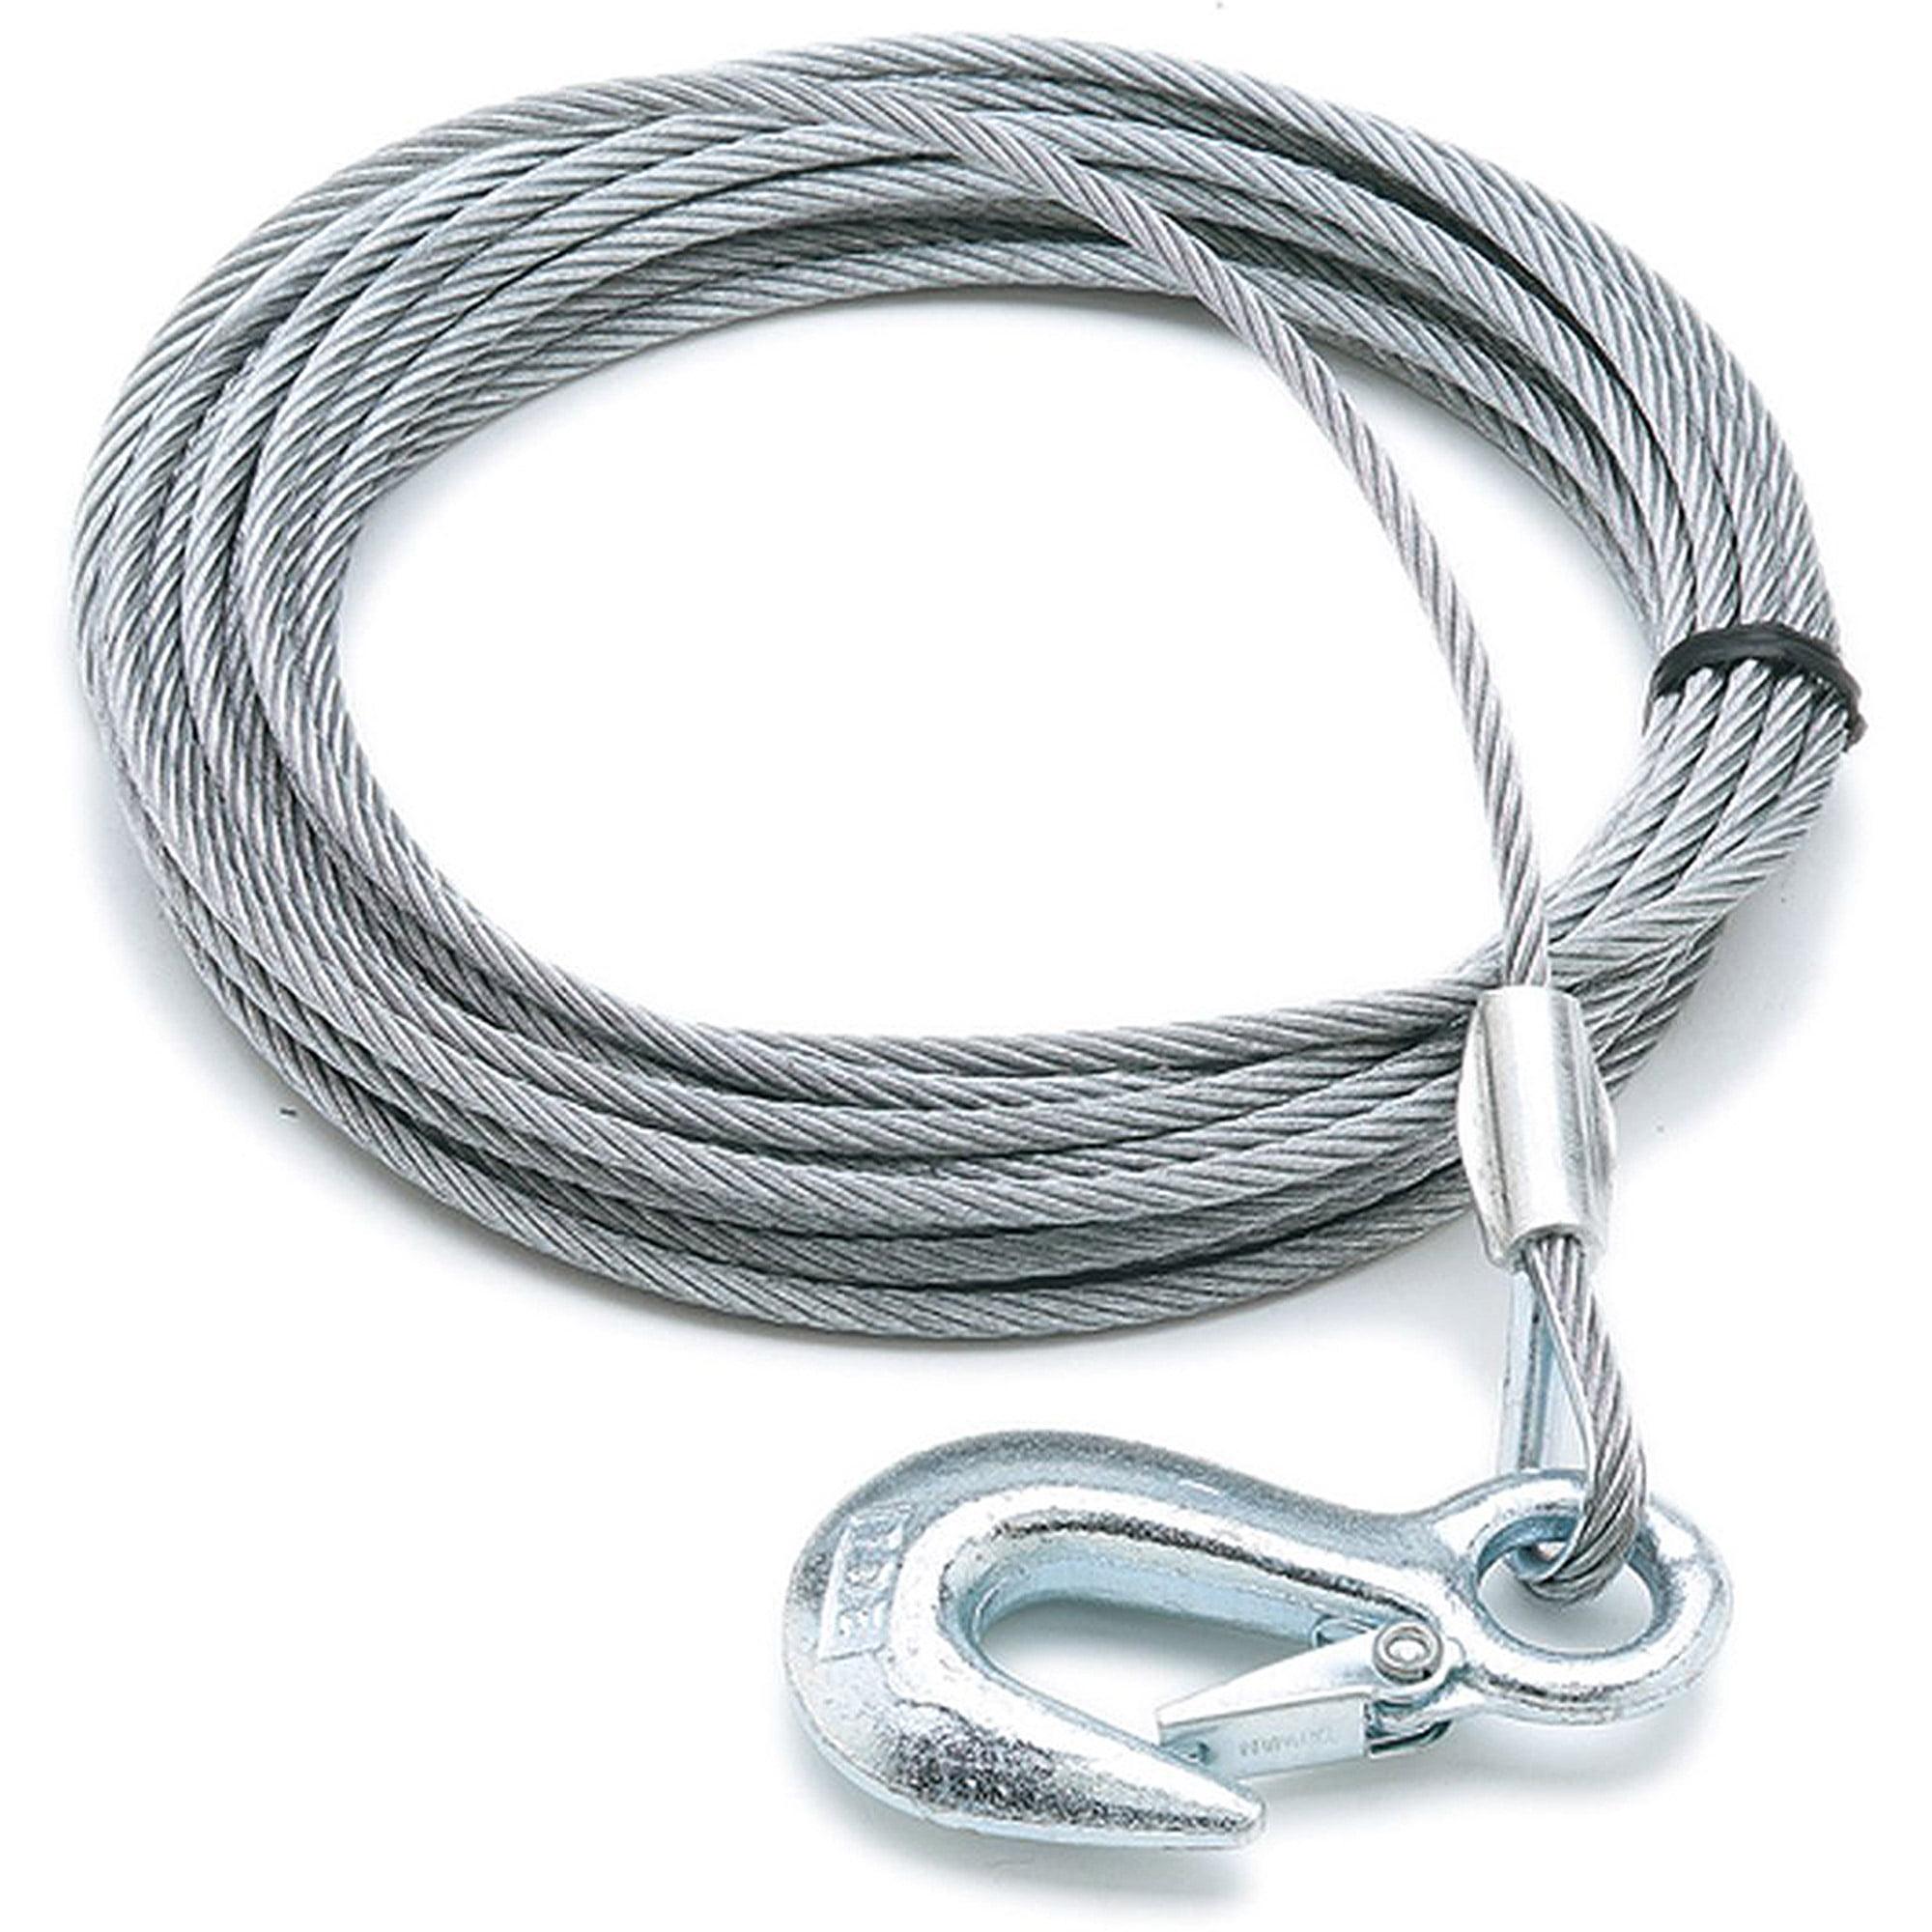 "SeaSense Trailer Winch Cable, 1/8"" x 20', 2000 lbs"